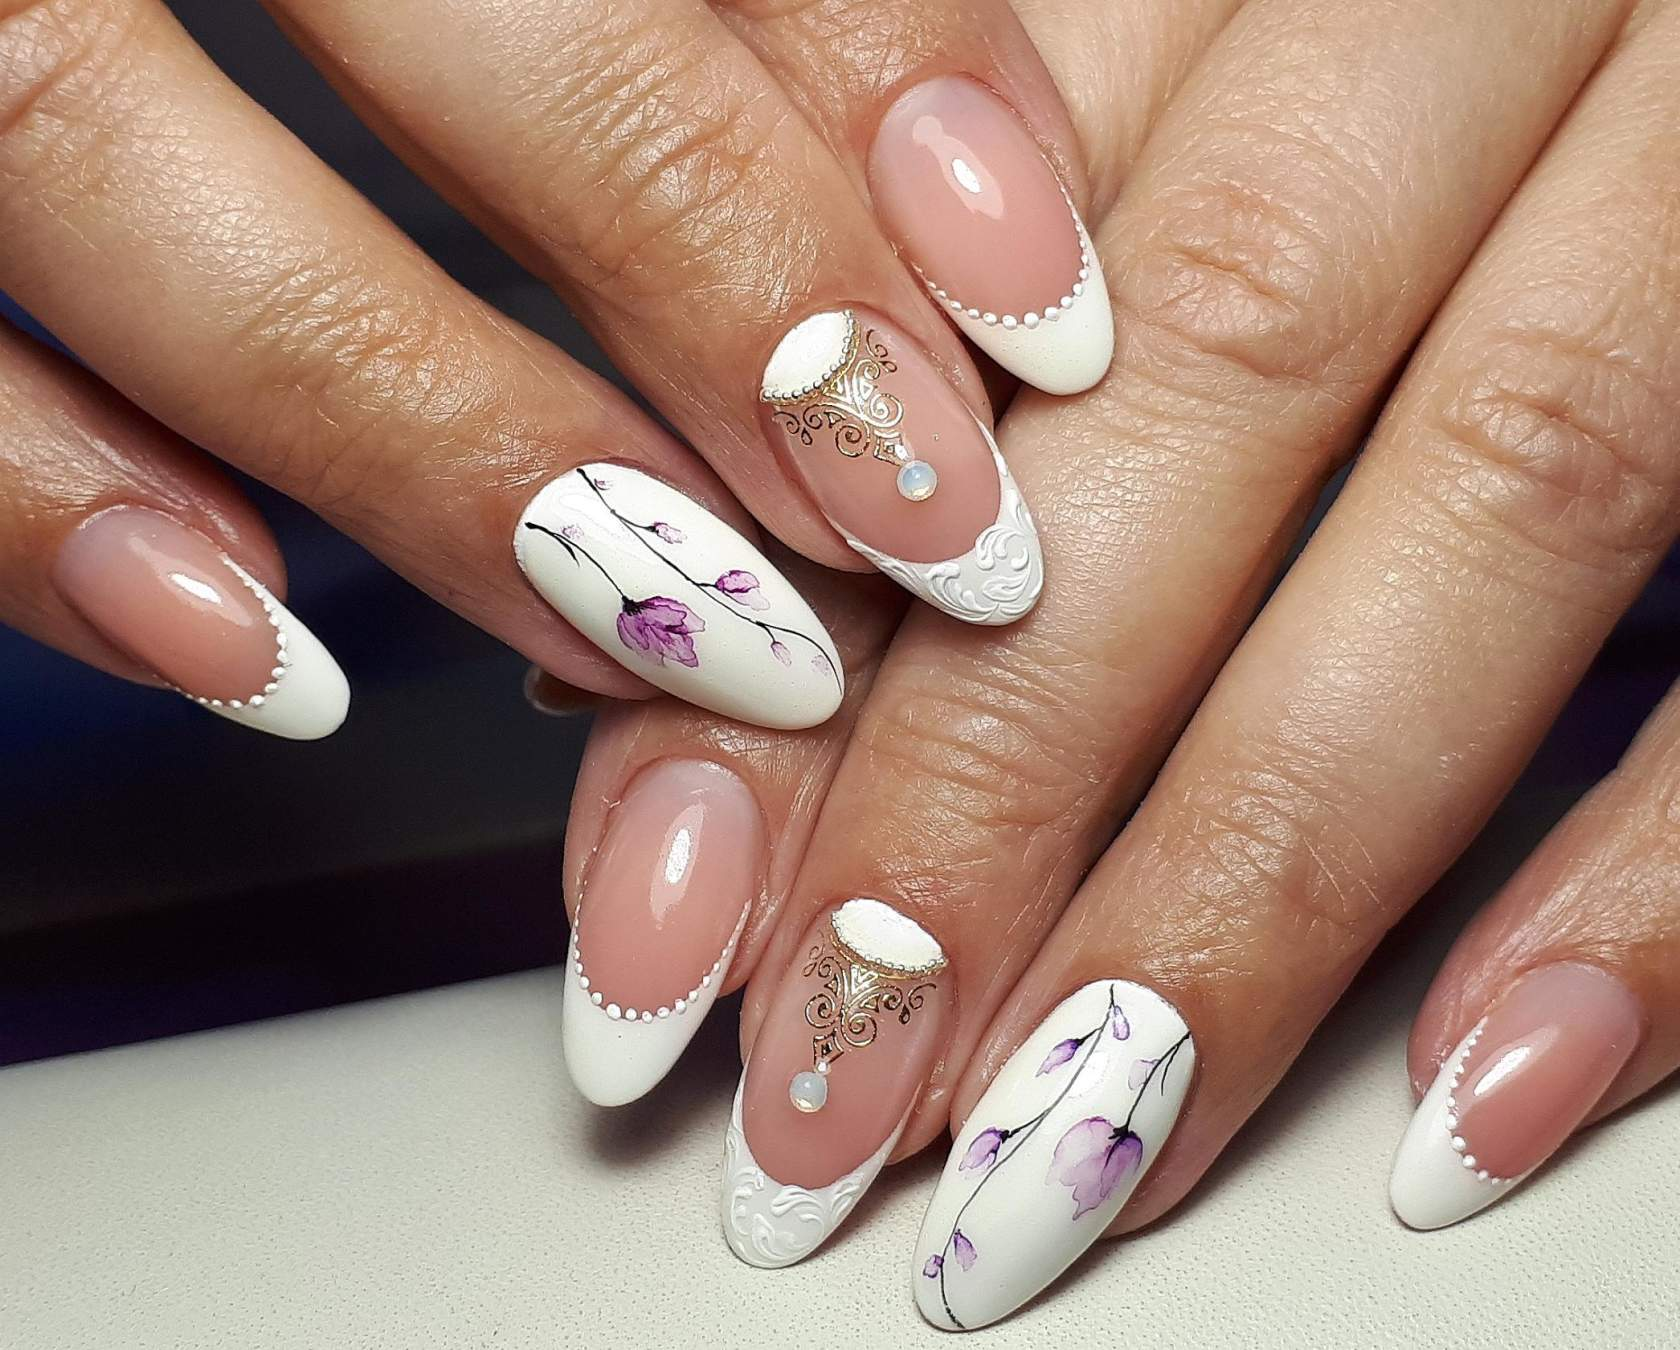 Картинки маникюра на ногтях френч с рисунком фото